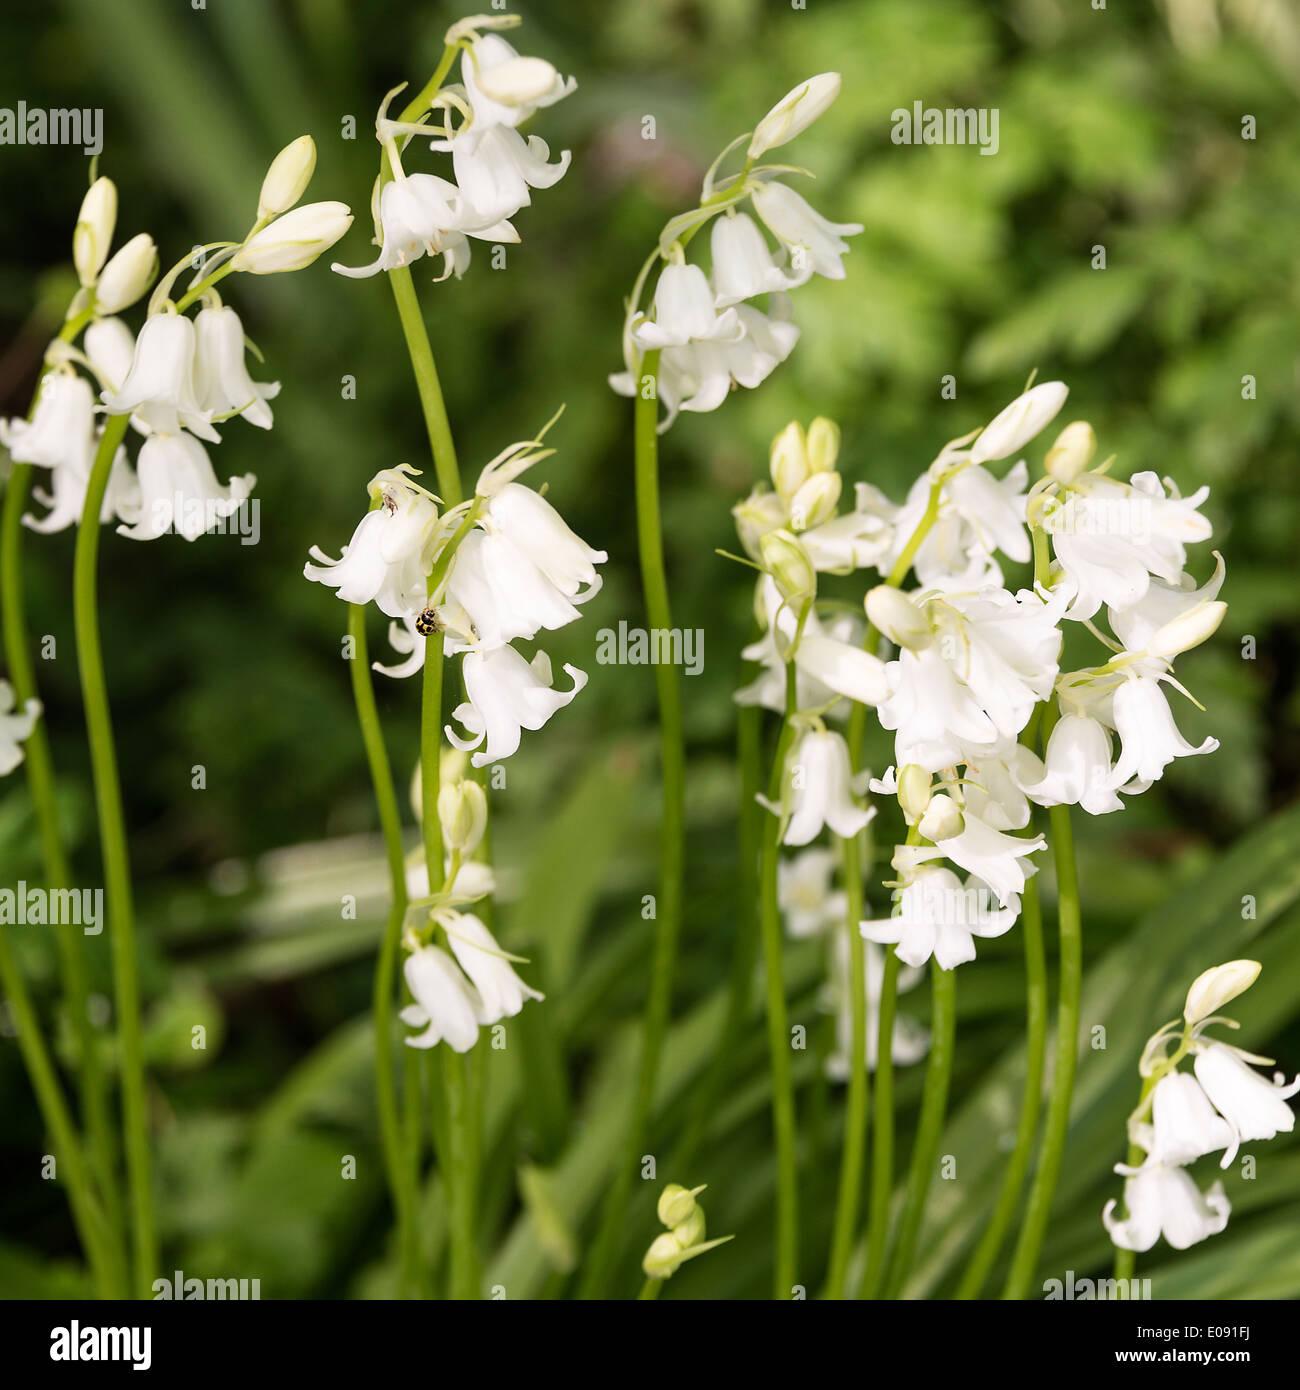 White bluebell hispanica flowers in spring bloom in an oxfordshire white bluebell hispanica flowers in spring bloom in an oxfordshire garden shipton under wychwood england united kingdom uk mightylinksfo Gallery